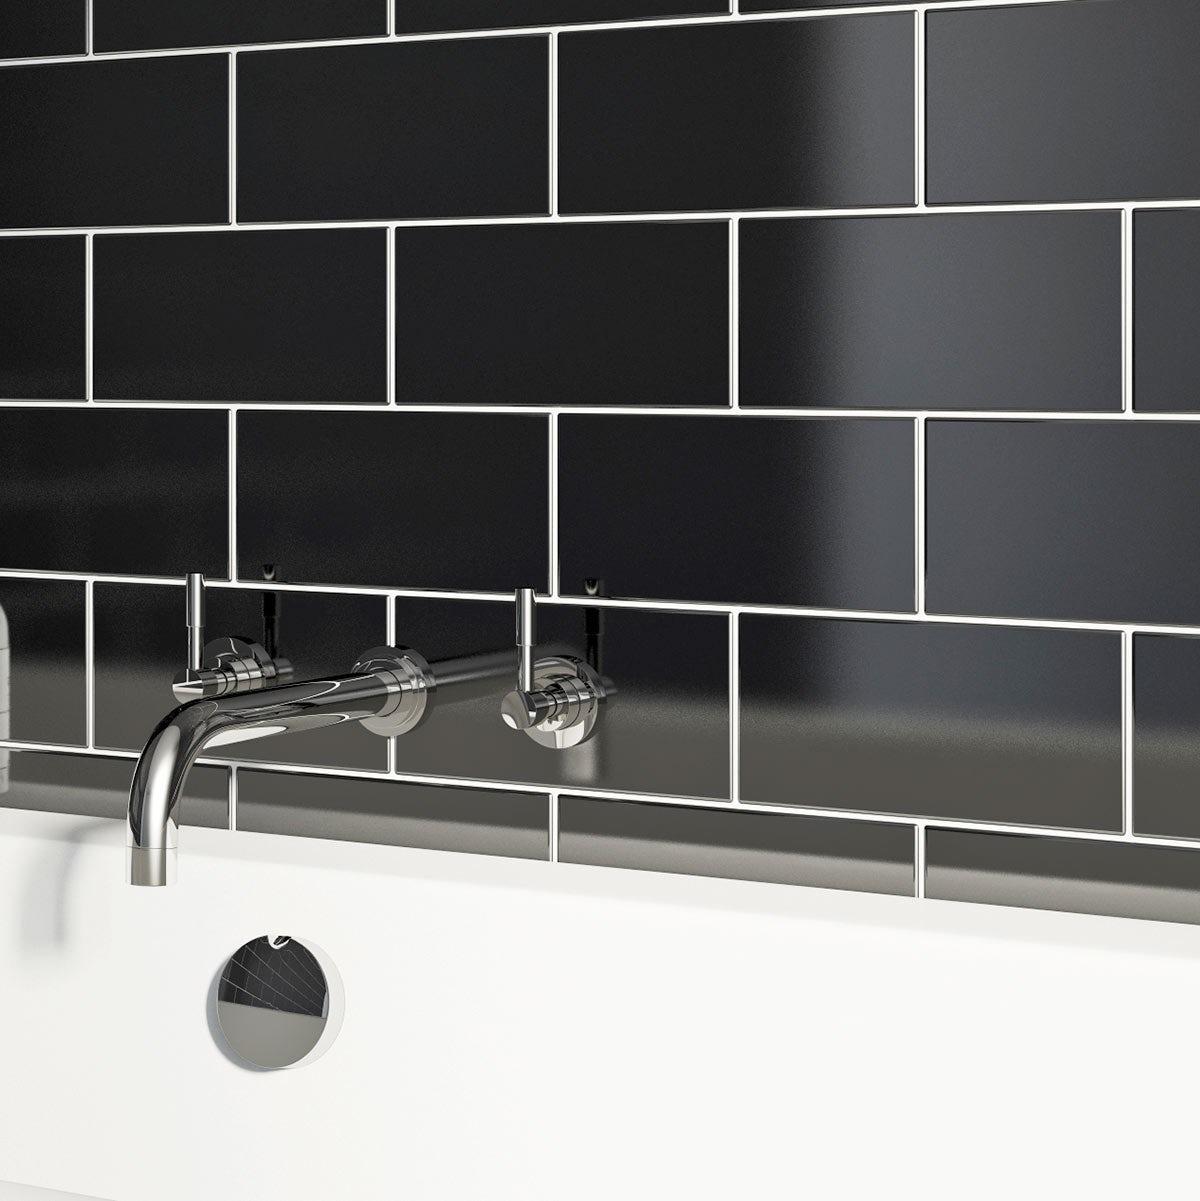 Black gloss tiles floor choice image tile flooring design ideas british ceramic tile metro flat black gloss tile 100mm x 200mm british ceramic tile metro flat dailygadgetfo Gallery